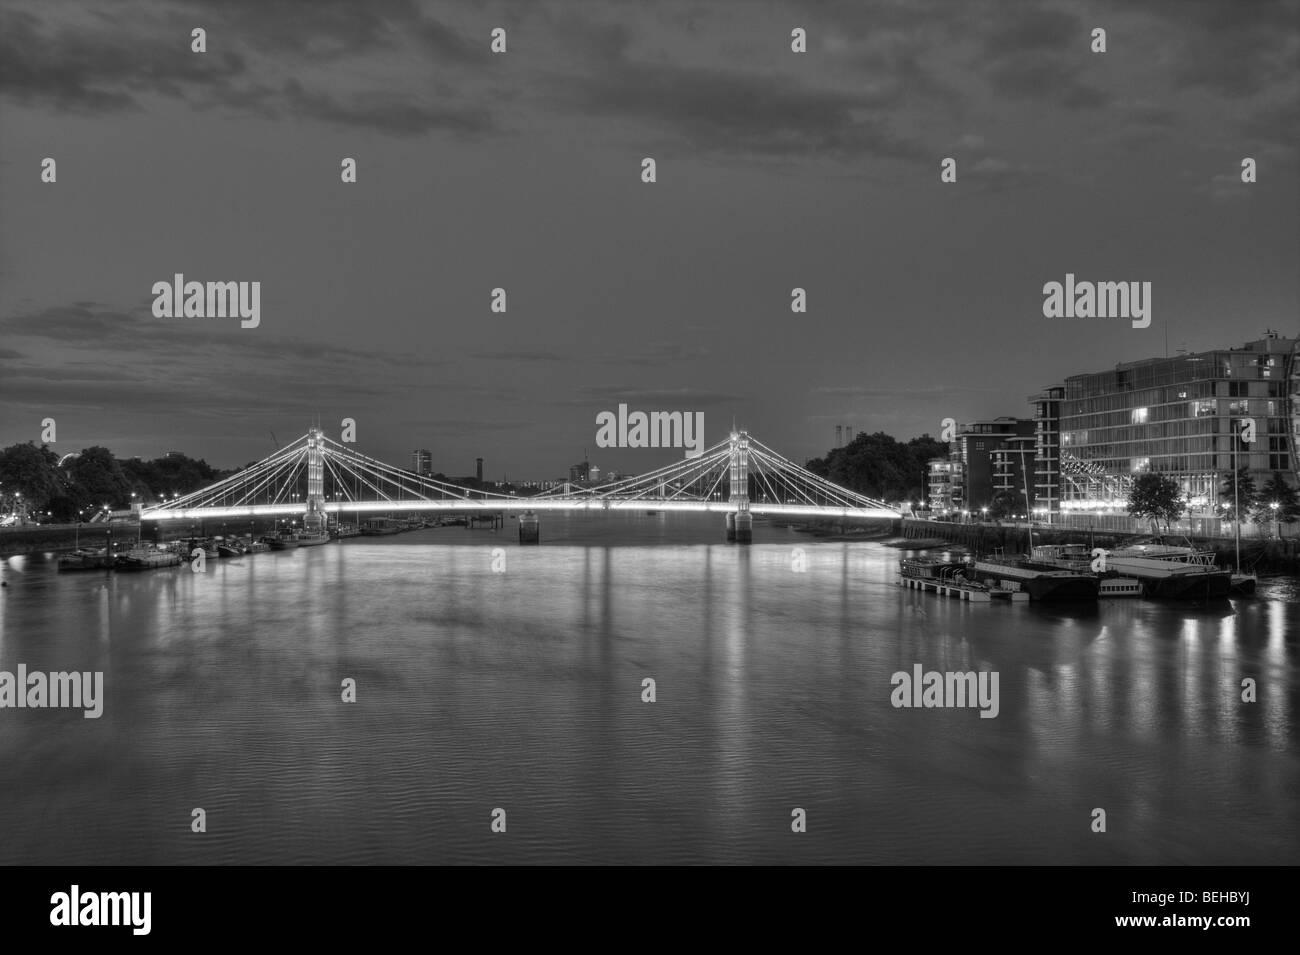 Albert Bridge and the river Thames, at night - Stock Image